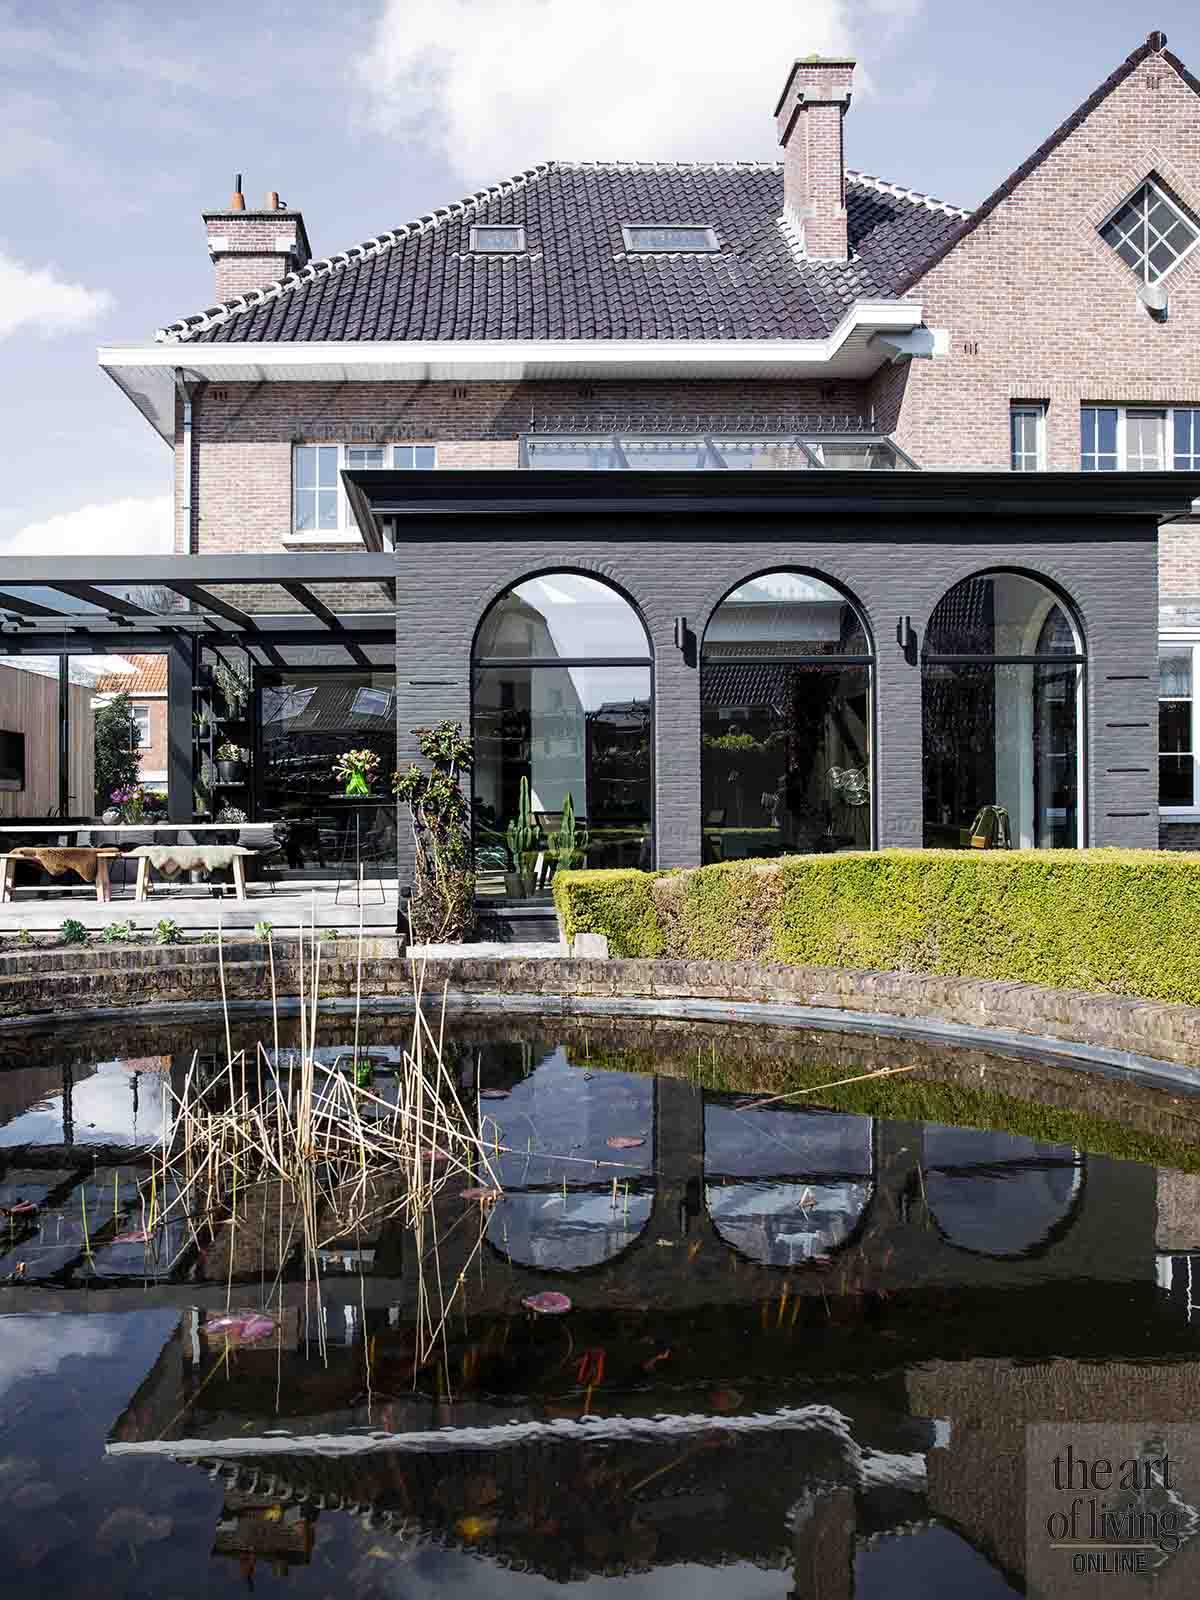 klassieke tuin | The Creative Company, the art of living